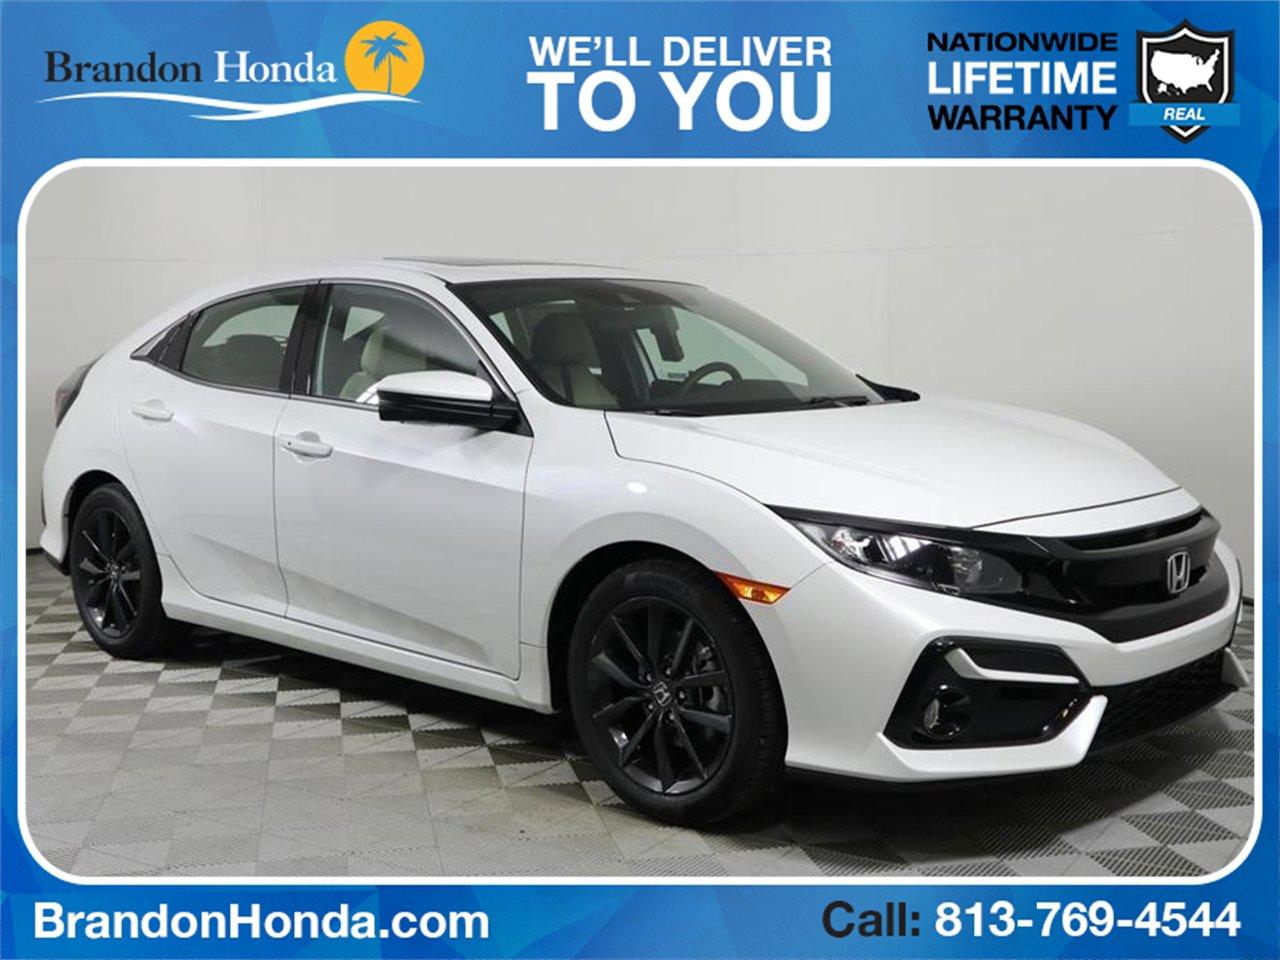 New 2020 Honda Civic Hatchback EX